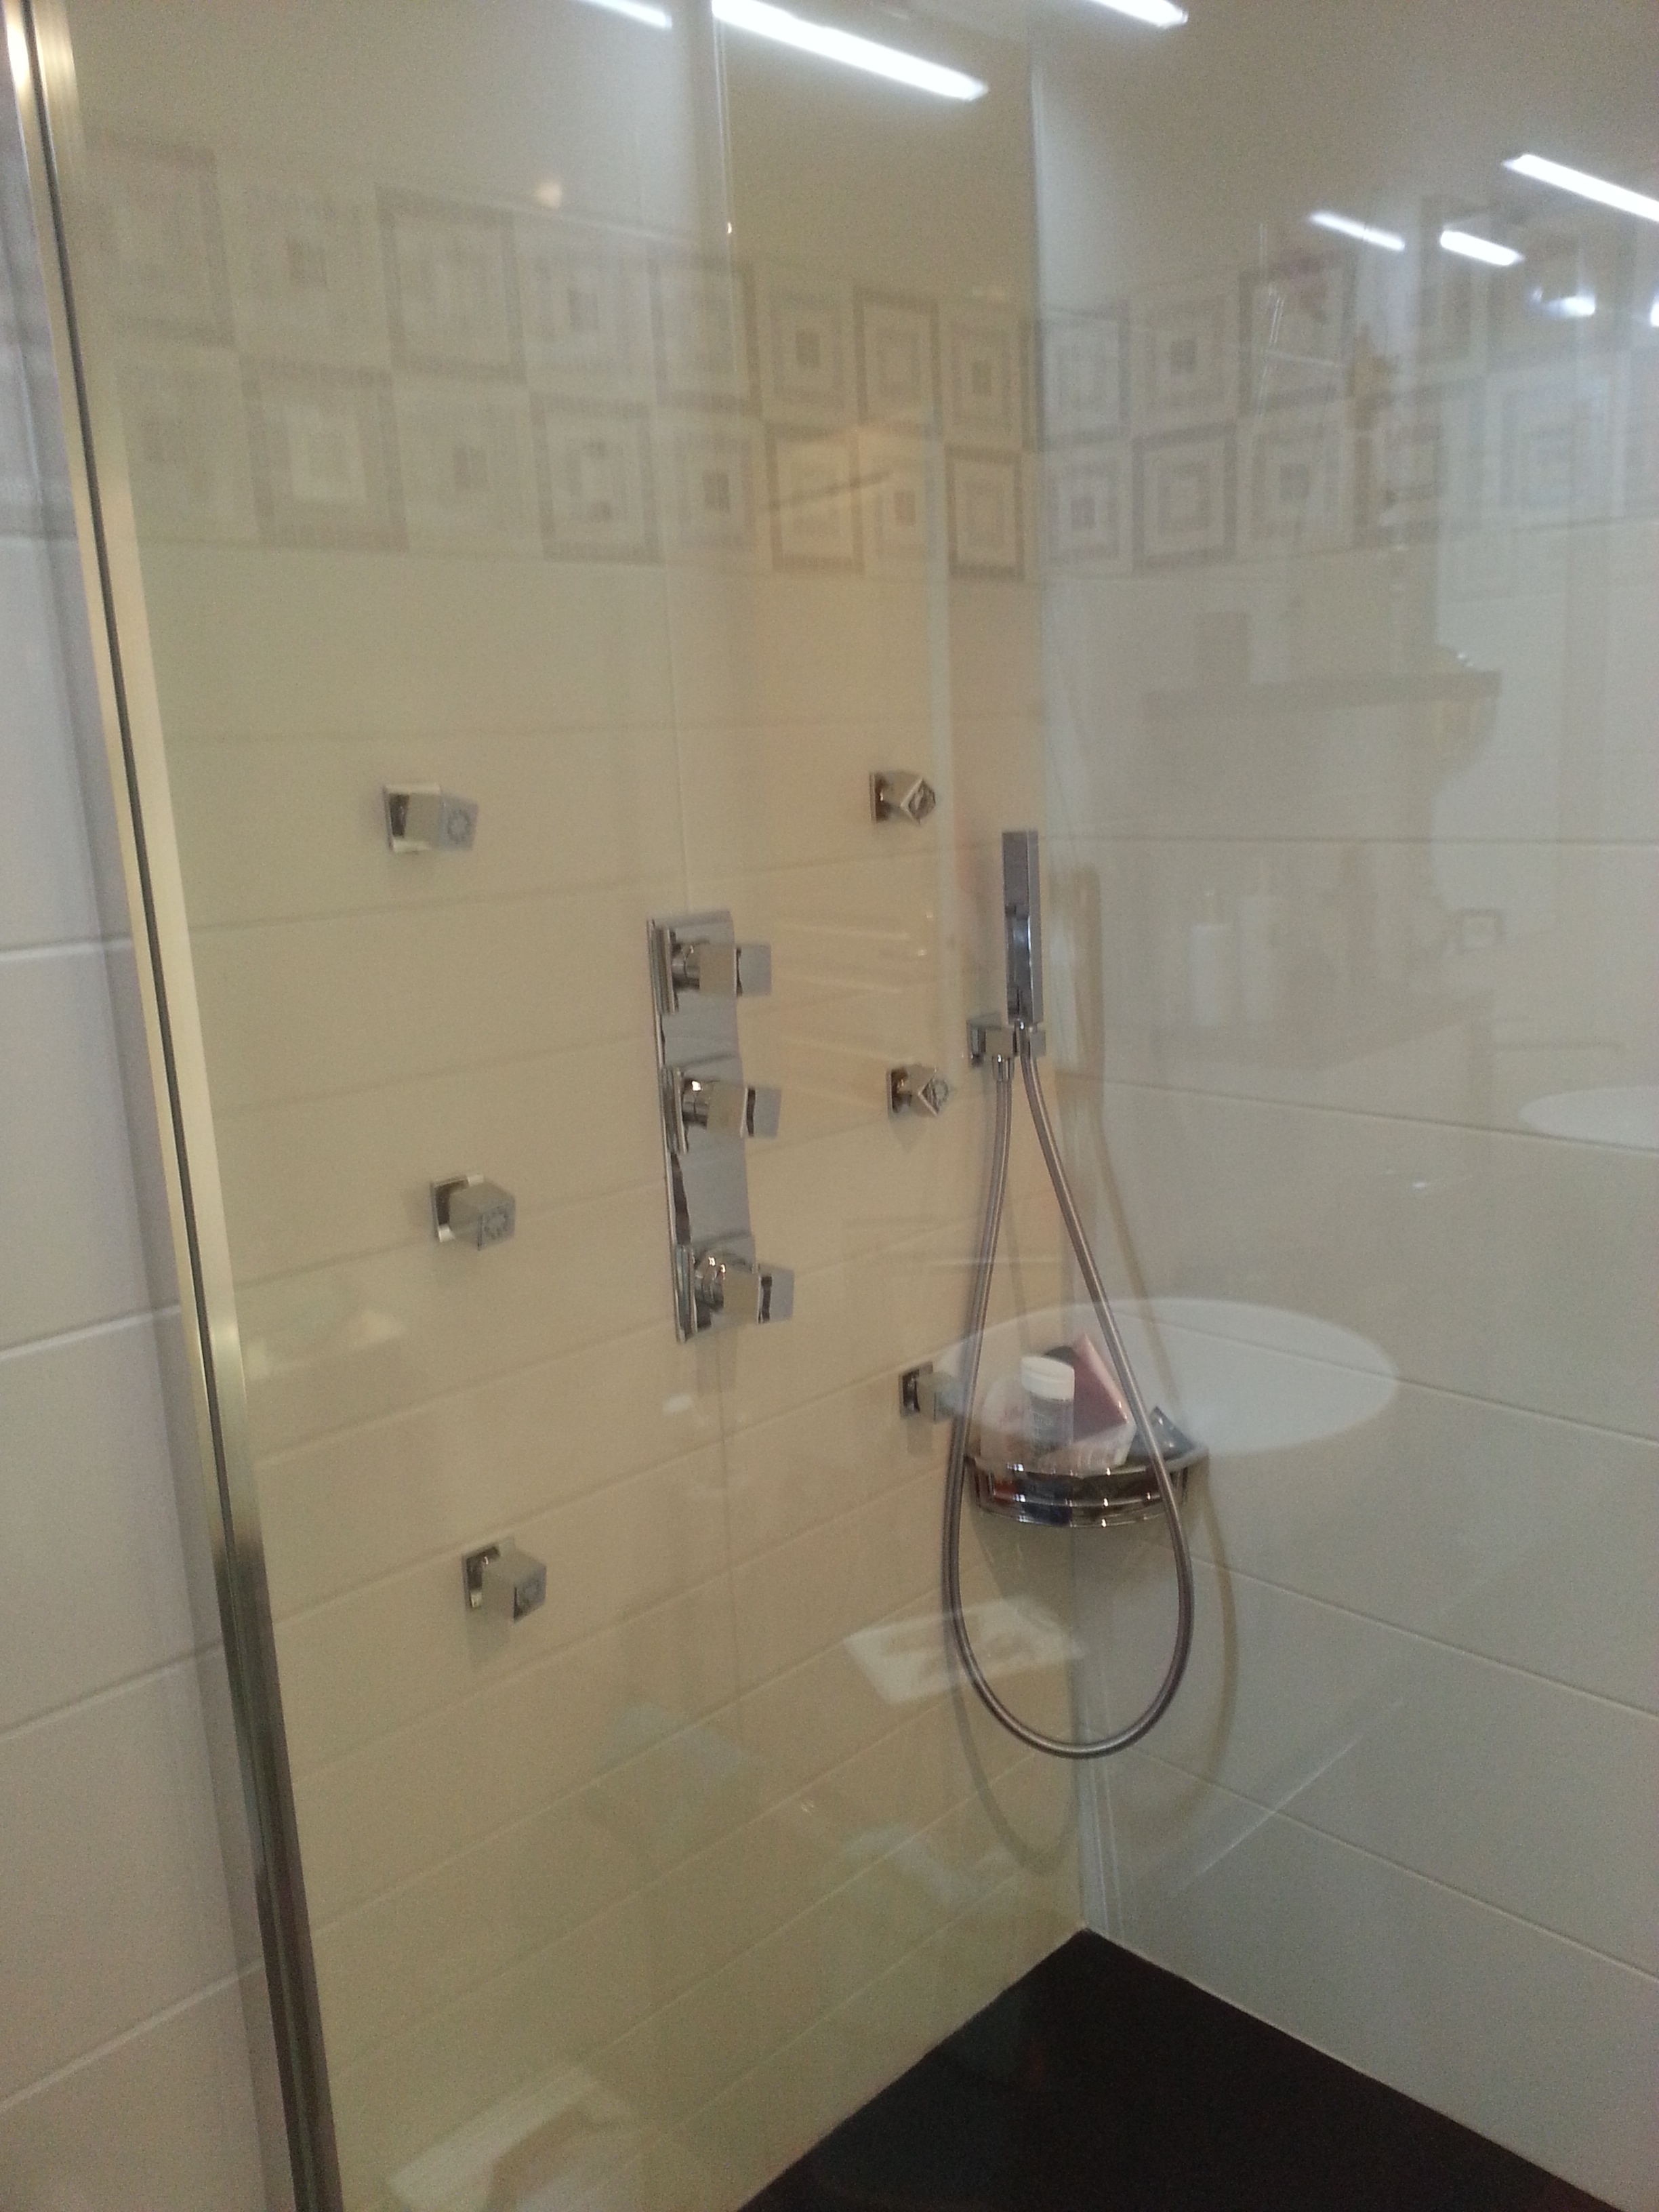 Service installation r novation sir service installation for Installation de salle de bain